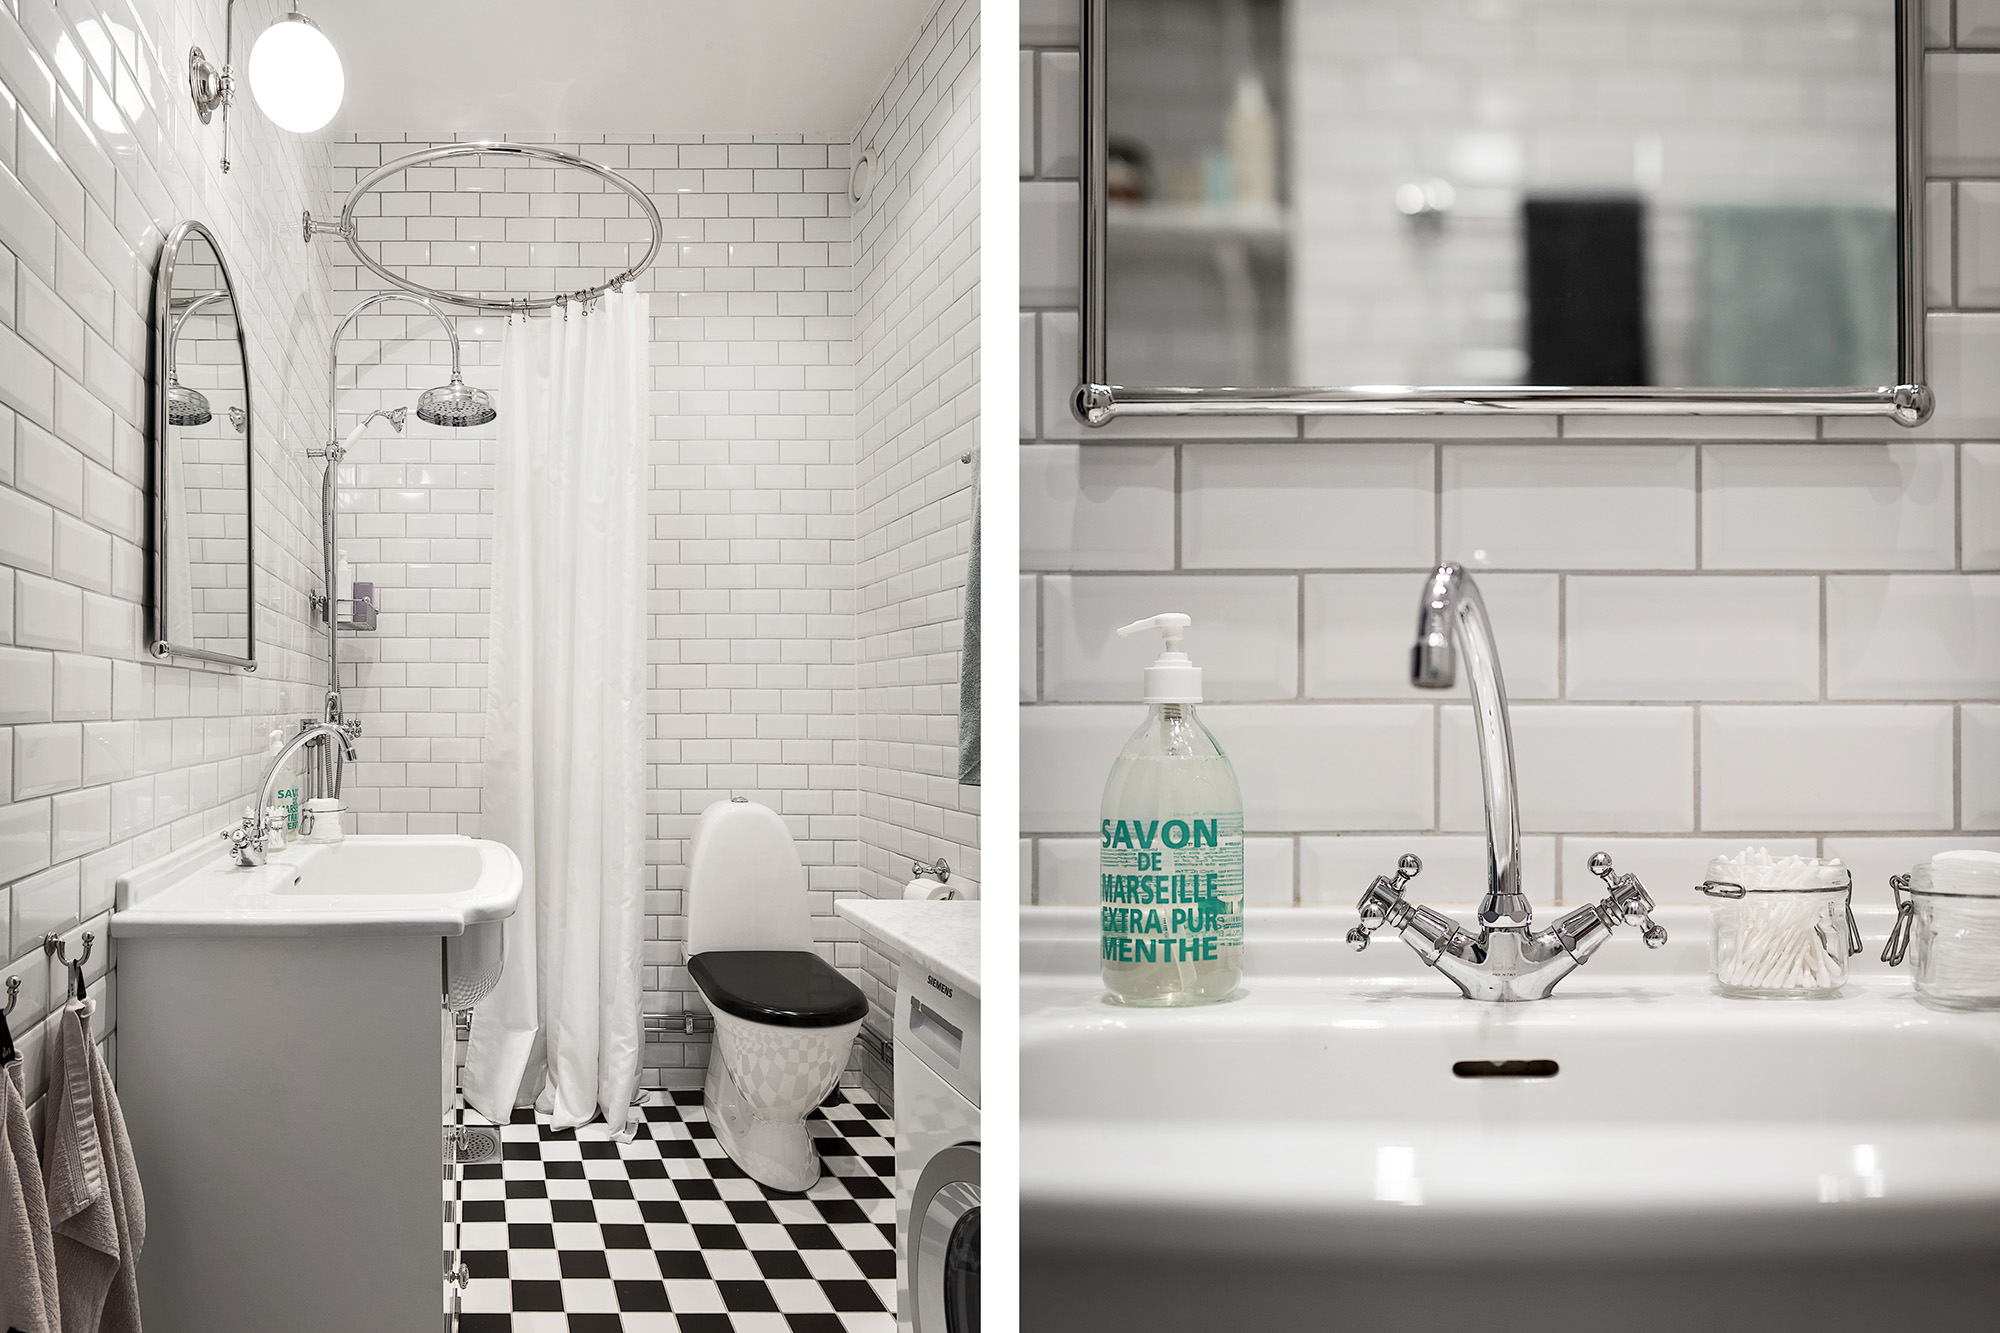 санузел душ раковина зеркало смеситель плитка